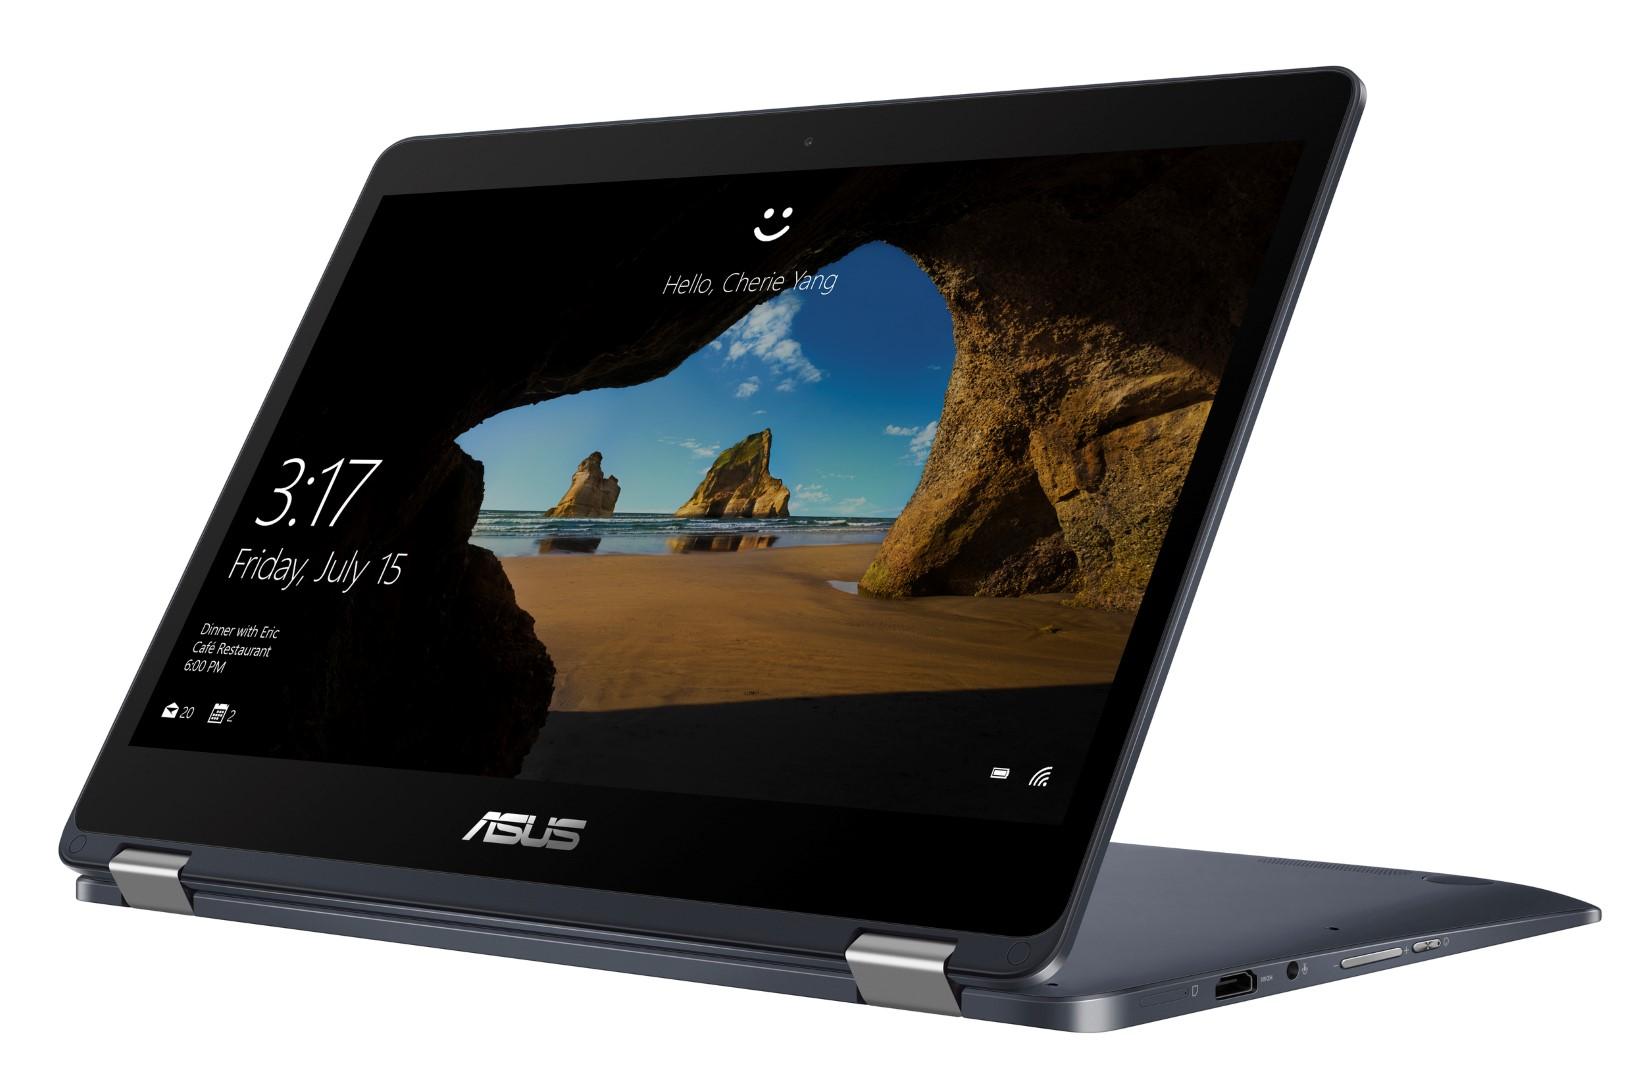 Photo of הכירו את המחשב החדש: אסוס נובה-גו ASUS NovaGo